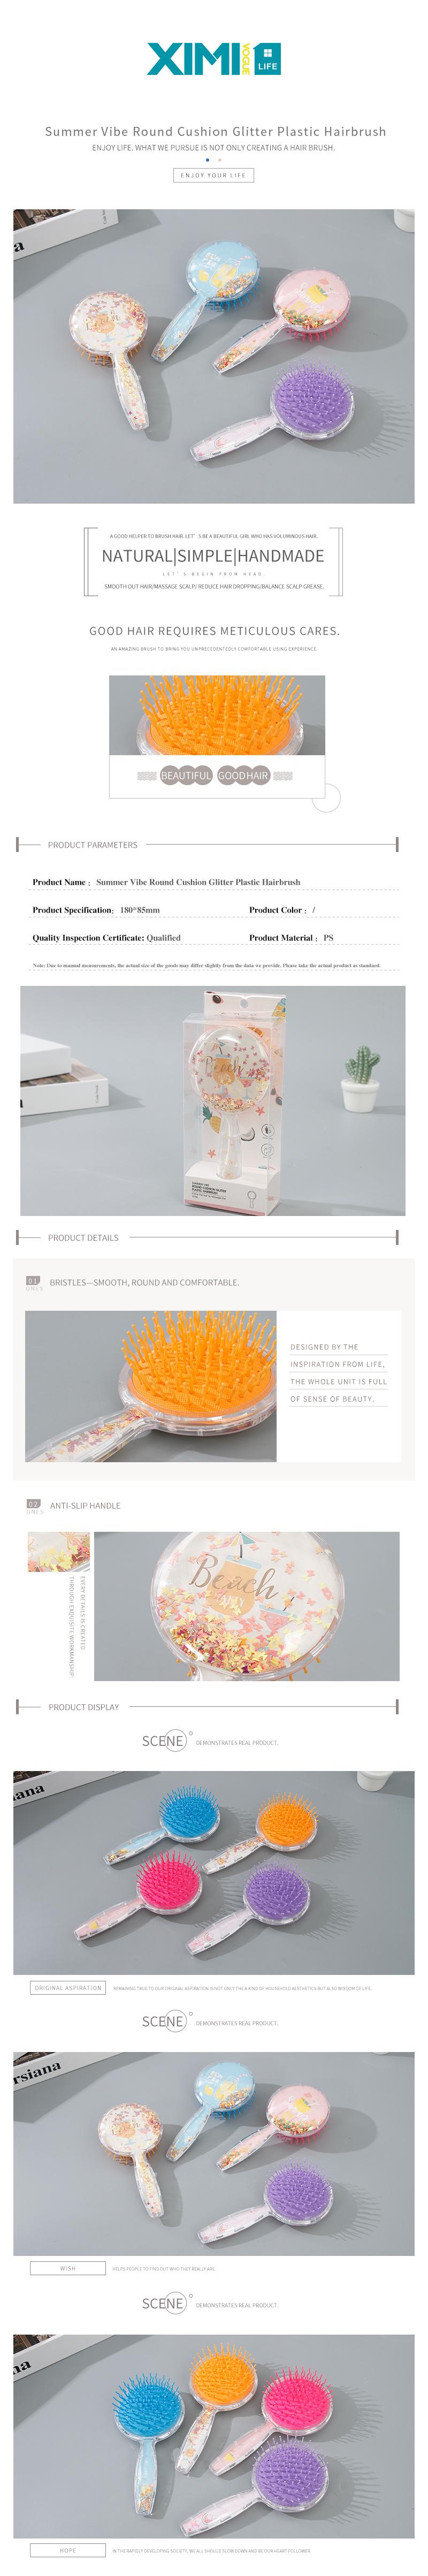 Summer Vibe Round Cushion Glitter Plastic Hairbrush /></p> </div> </div> </div> <div class=